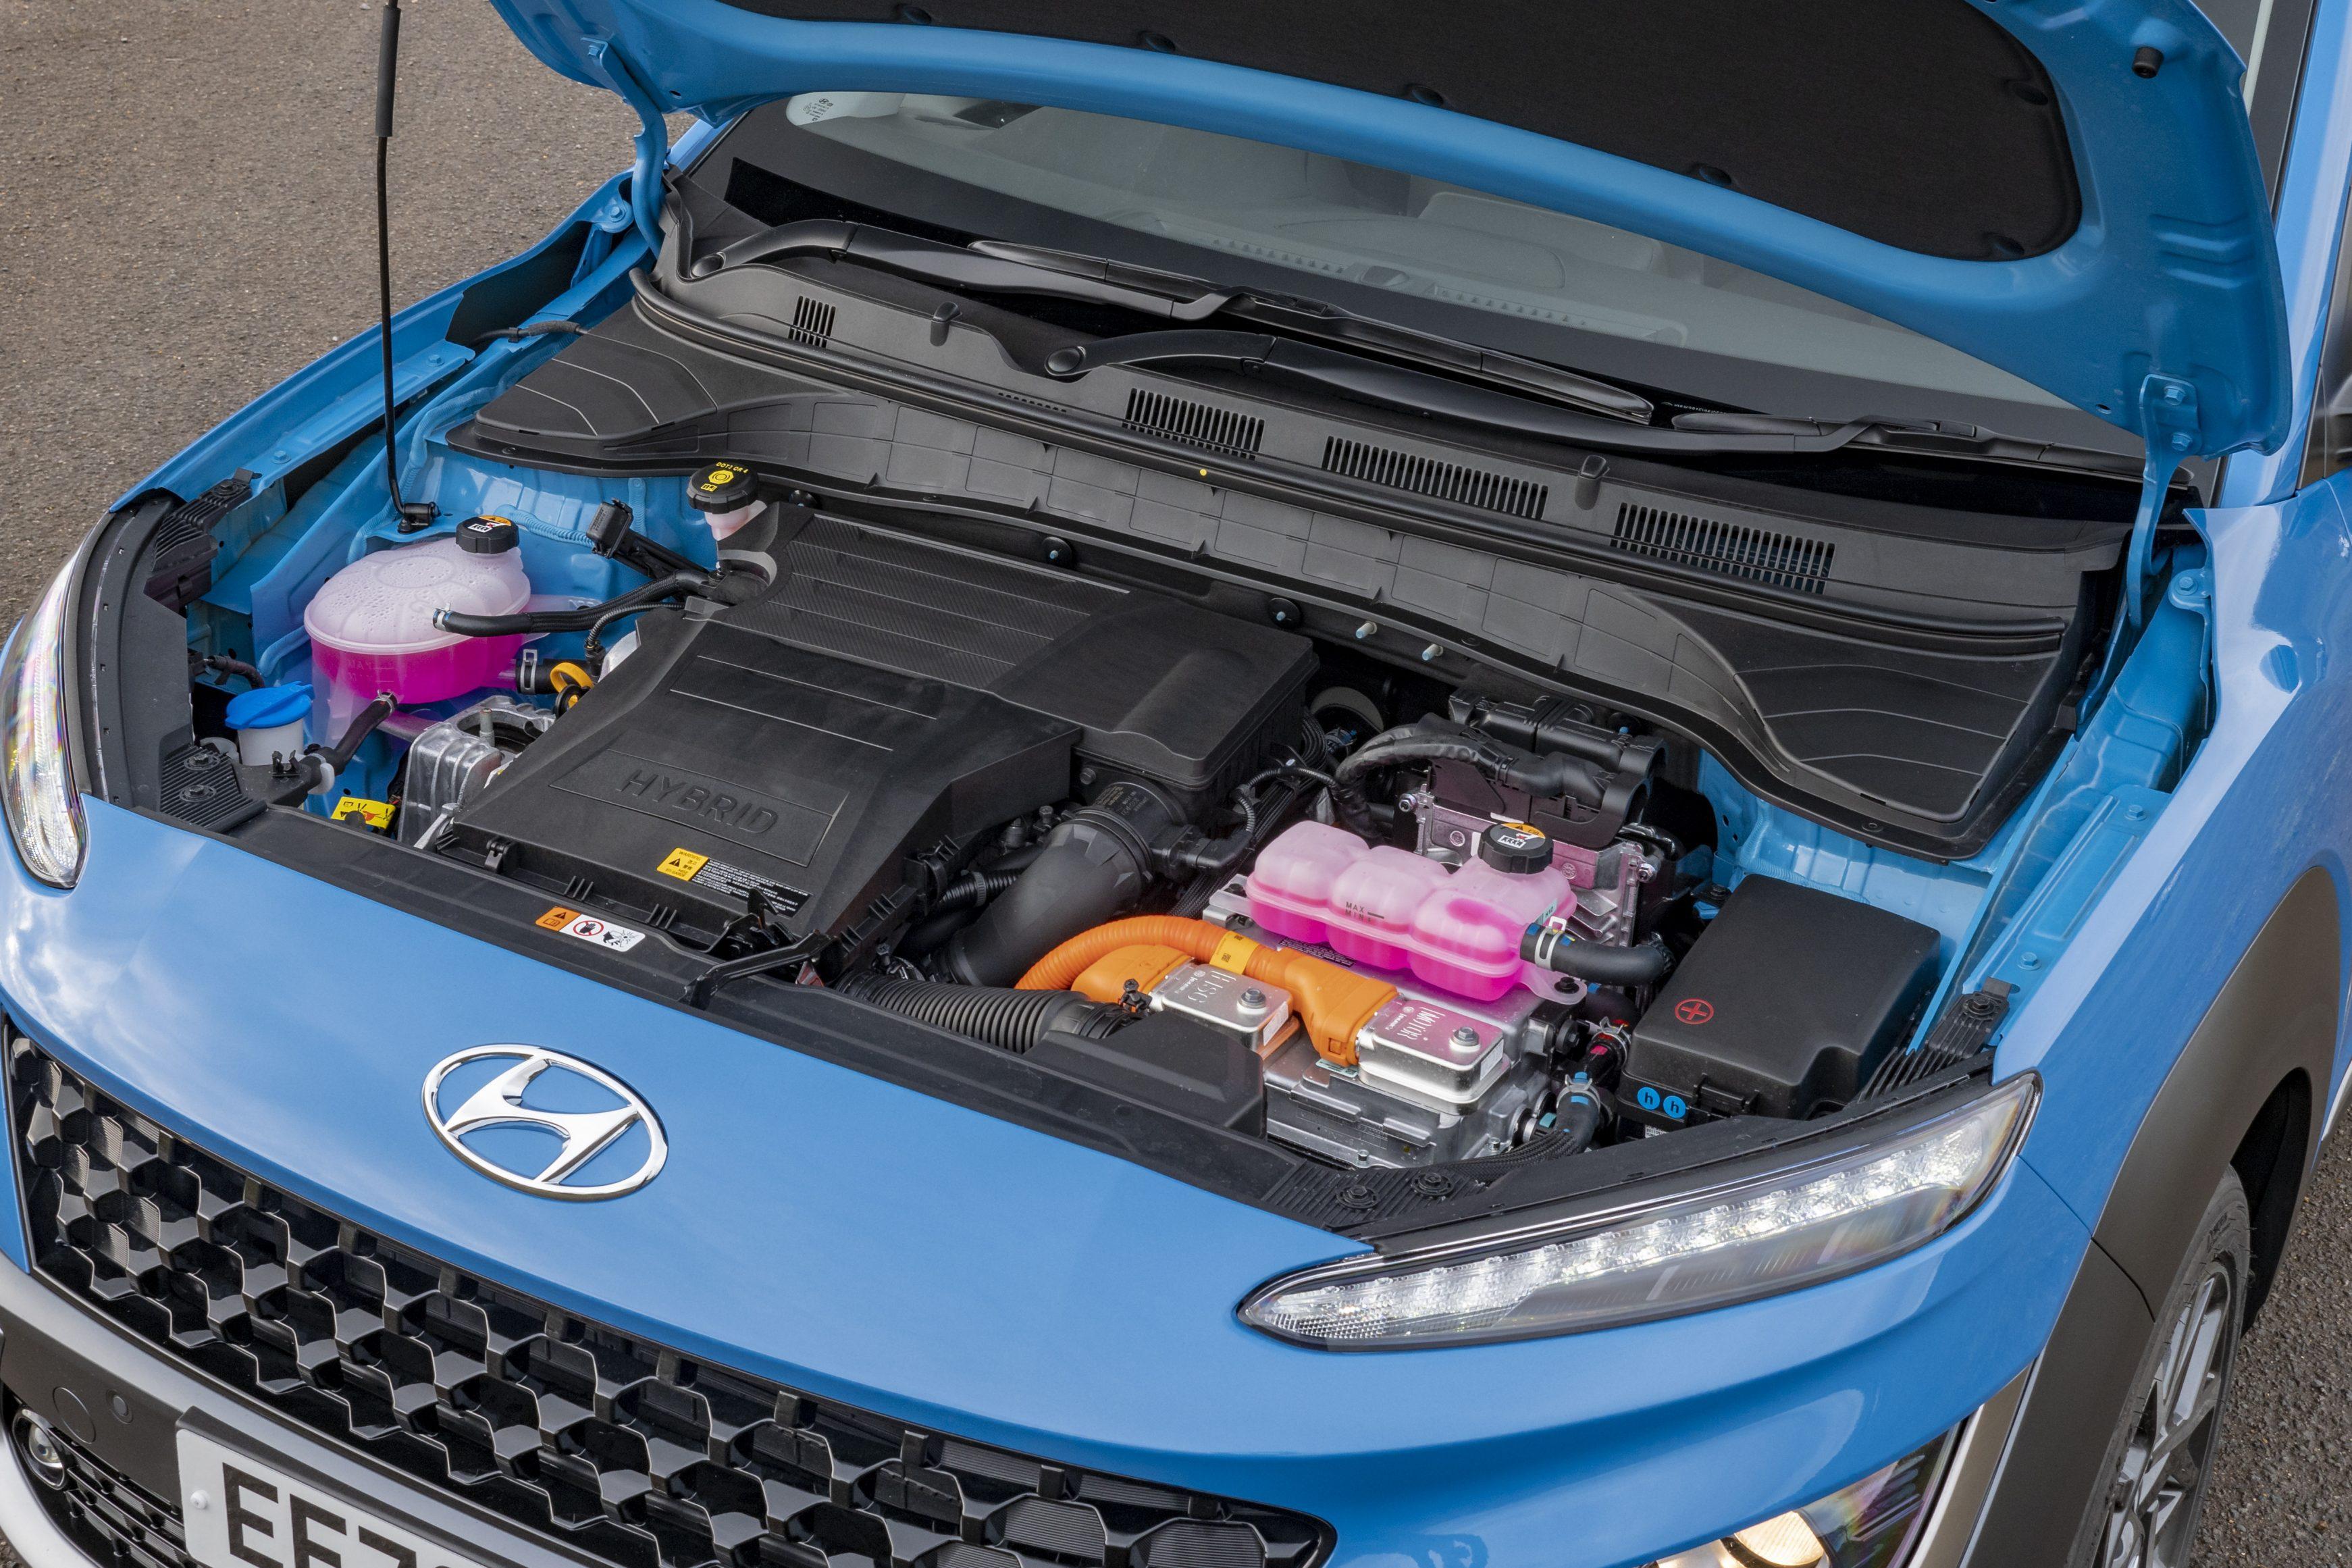 The Hyundai Kona Hybrid has an excellent 1.6-litre petrol-electric unit